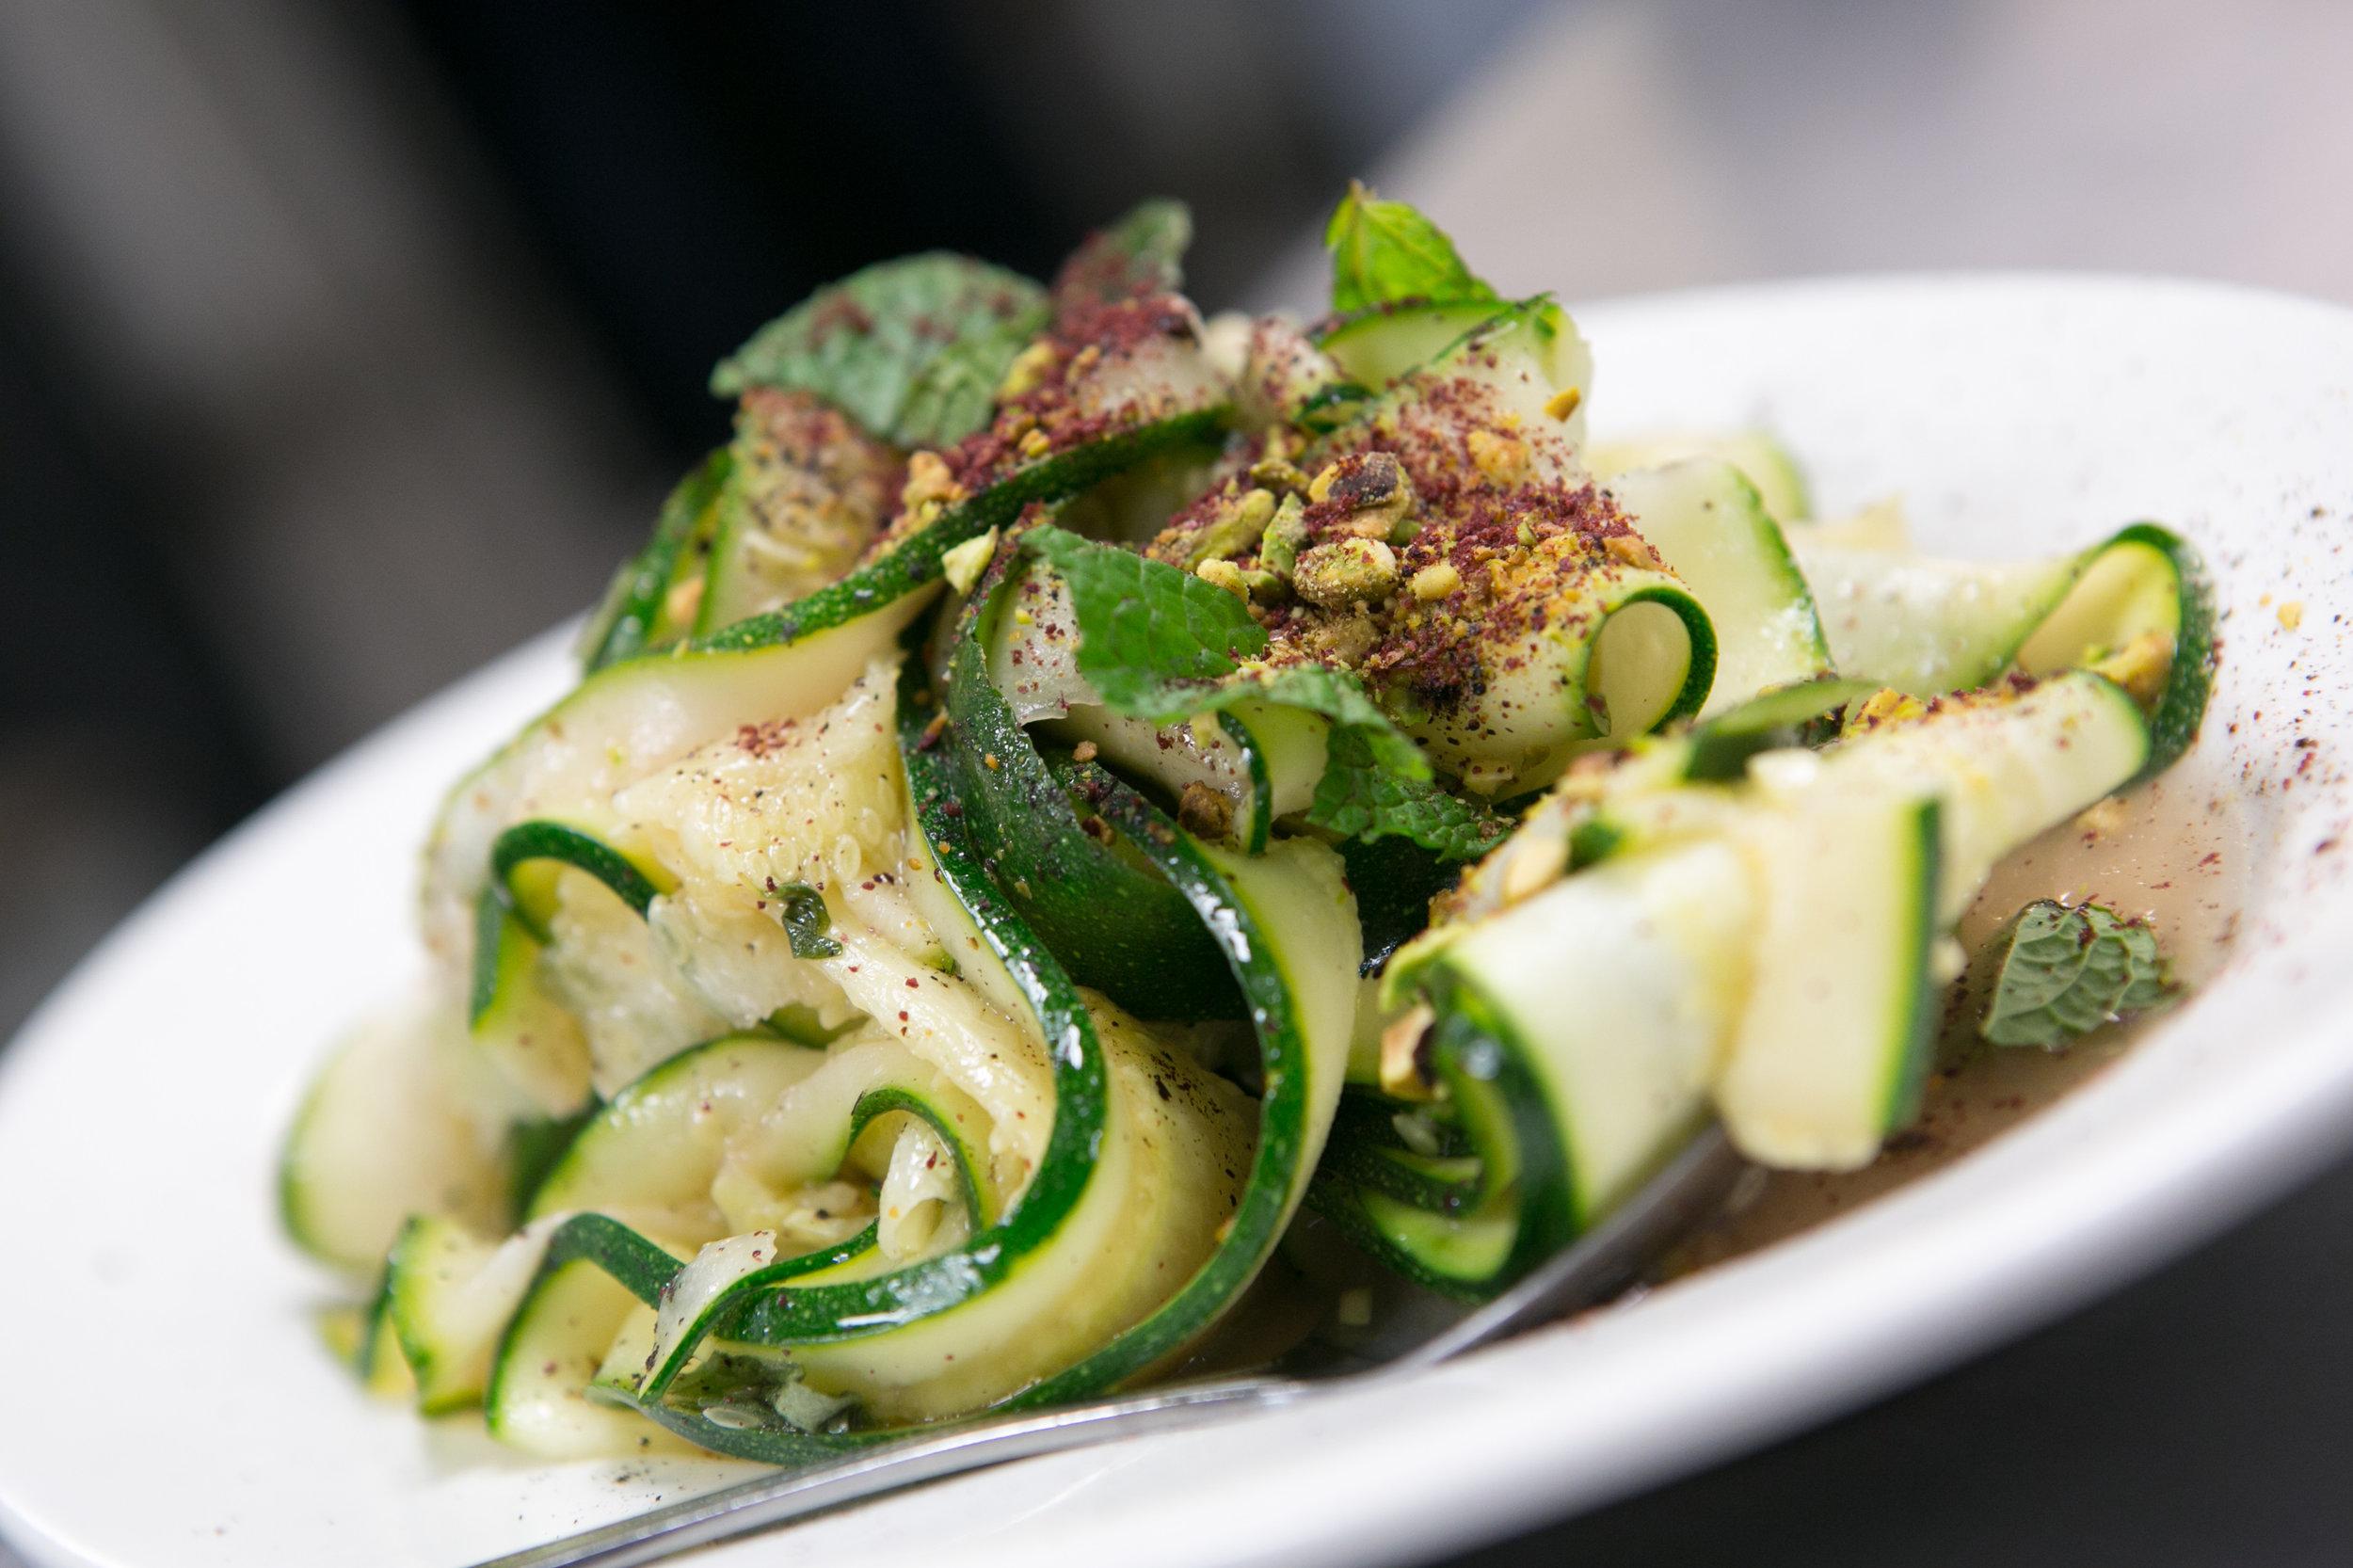 Raw zucchini salad with sumac vinaigrette and fresh herbs.-1.jpg